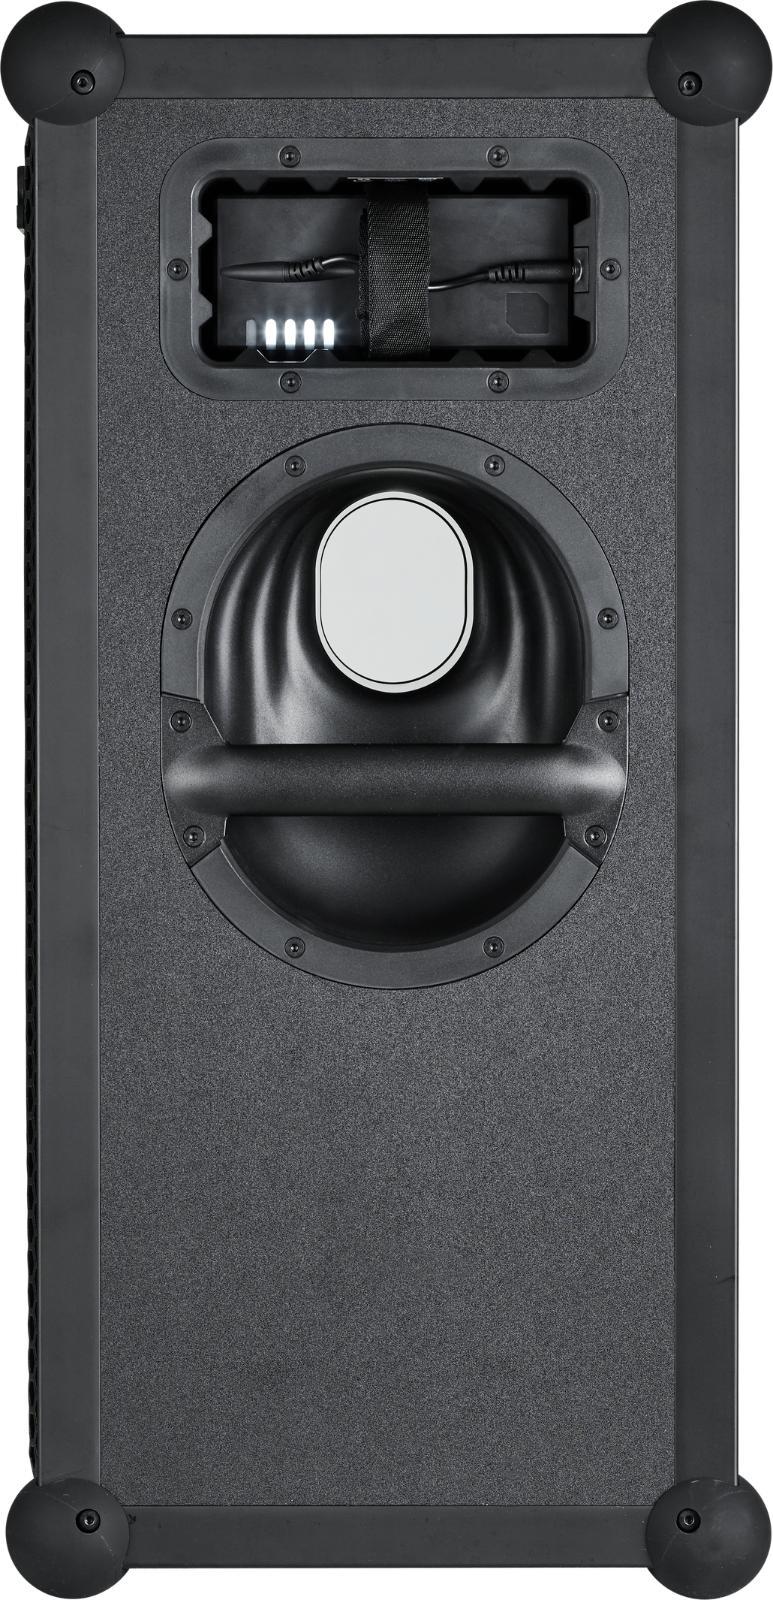 The New SOUNDBOKS - The Portable Performance